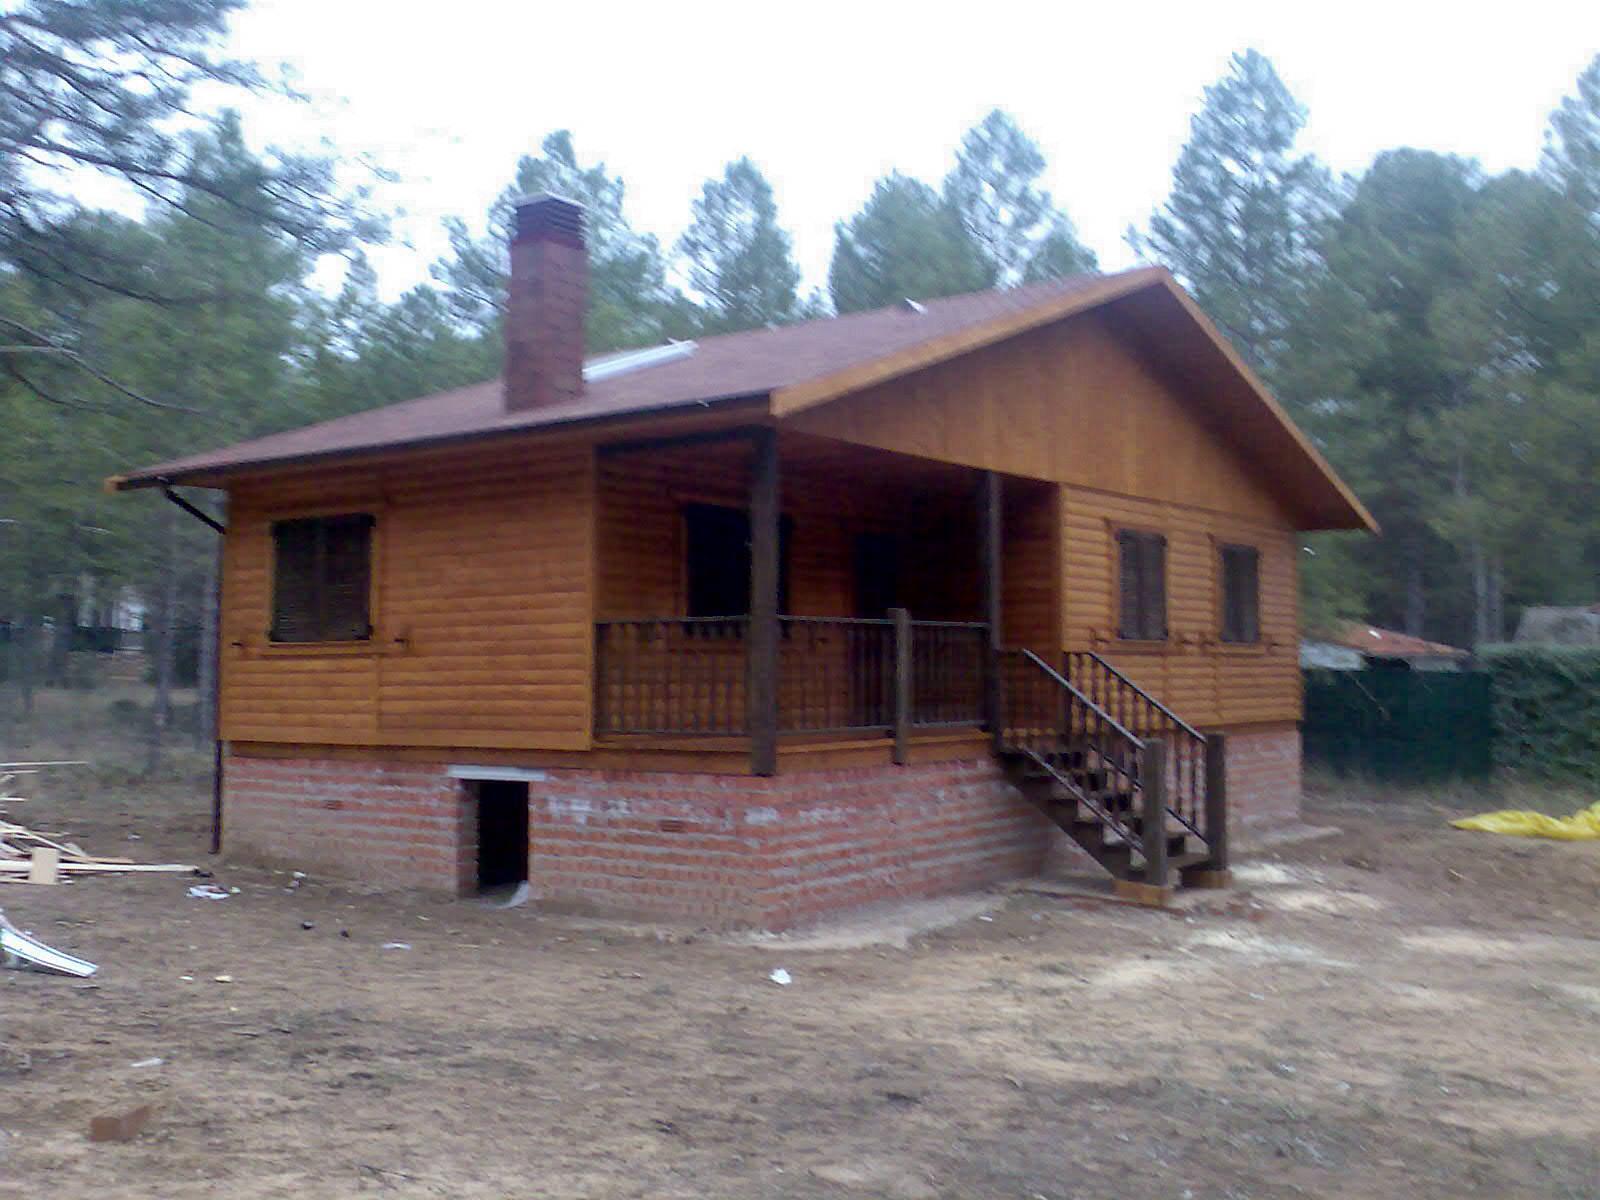 Casa de madera comprar casas de madera - Tocar madera casas ...